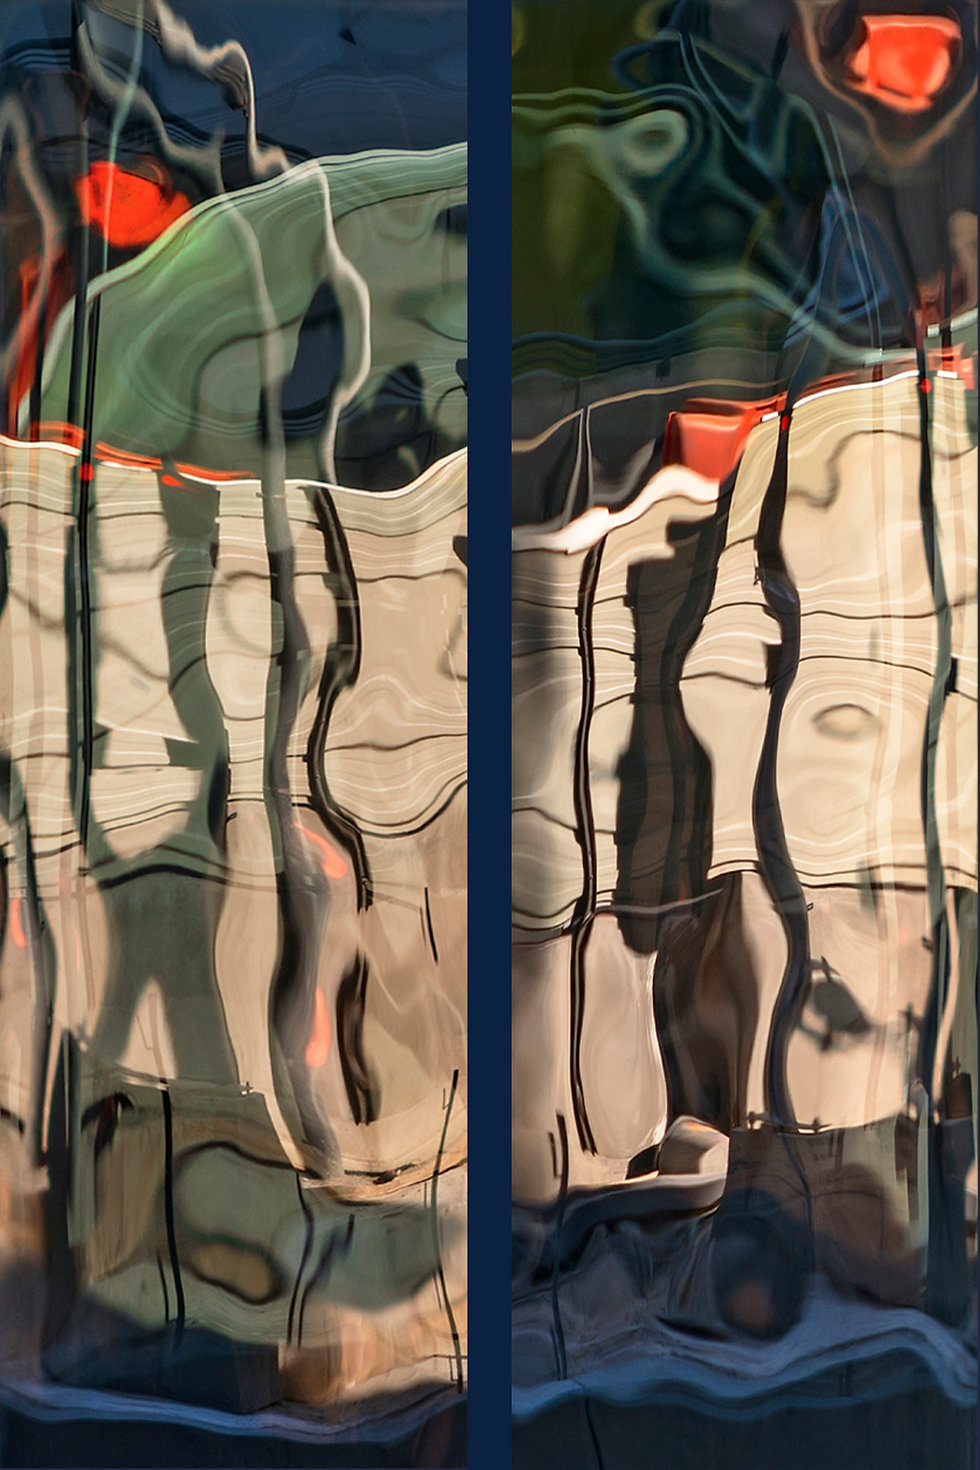 RÉFLEXION Nº 62 (diptych)  Large format fine art photograph by Denis Eugene Robert on TRAGART